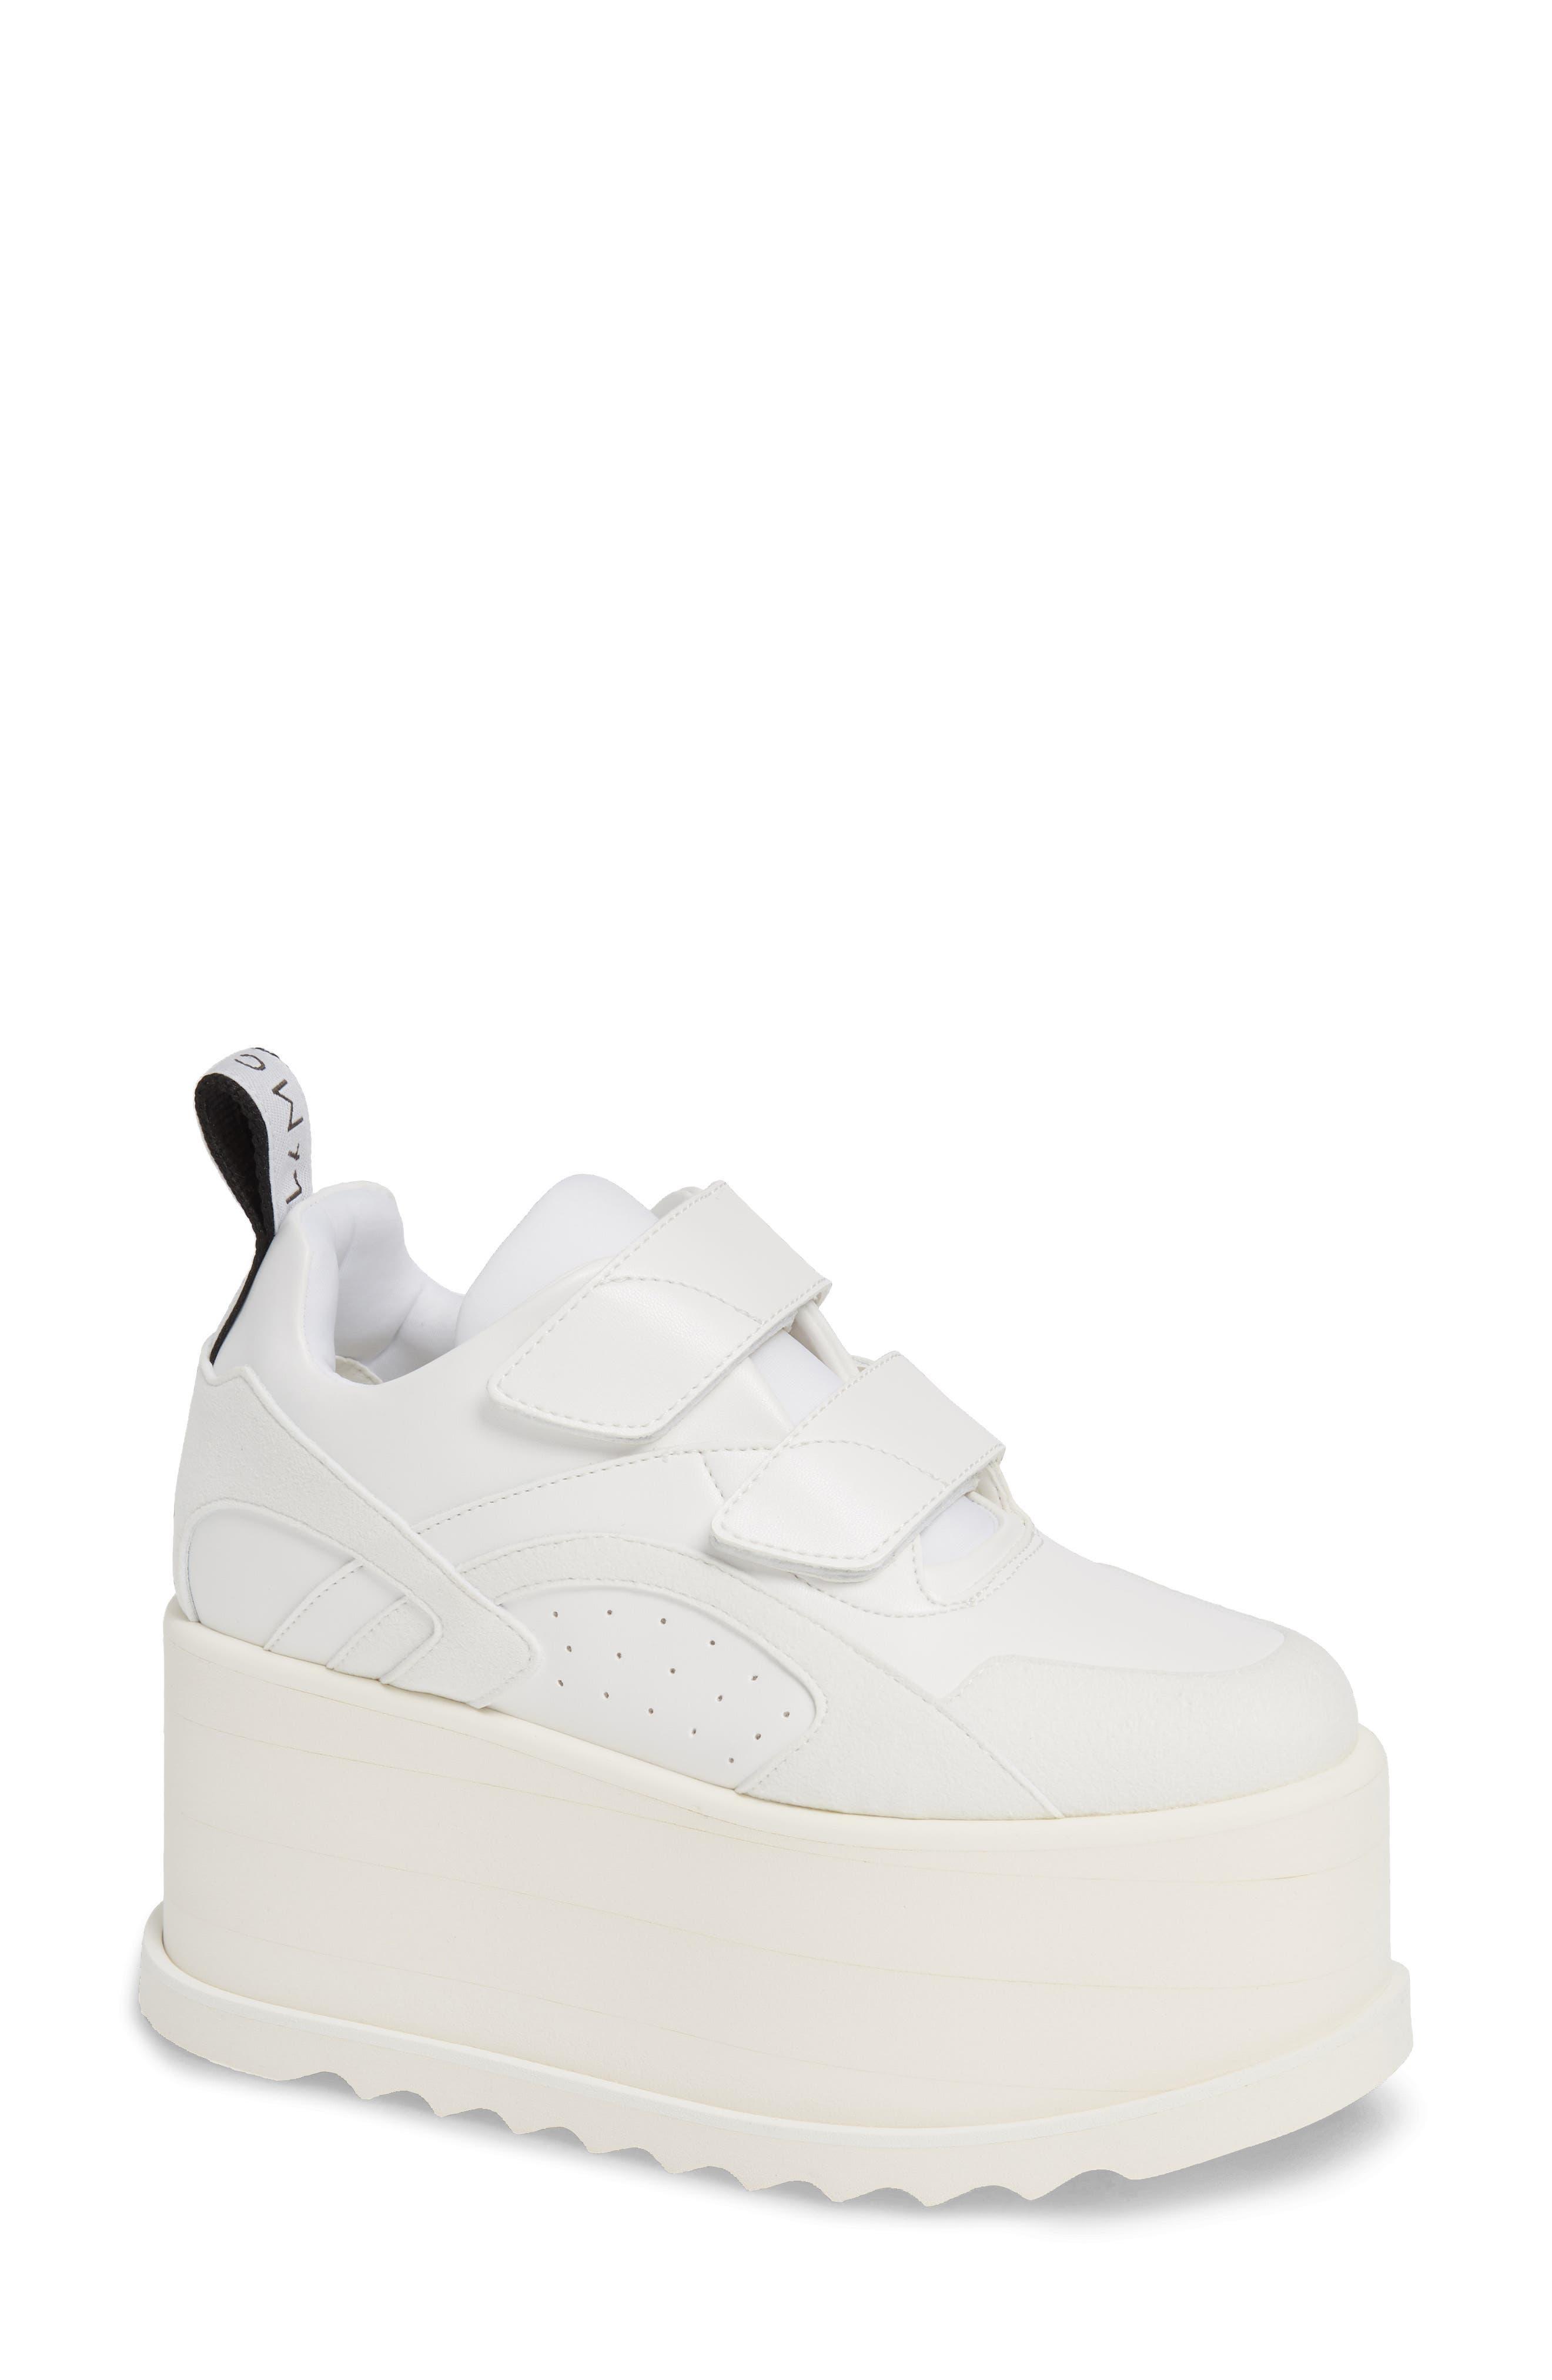 Stella Mccartney Eclypse Platform Sneaker - White